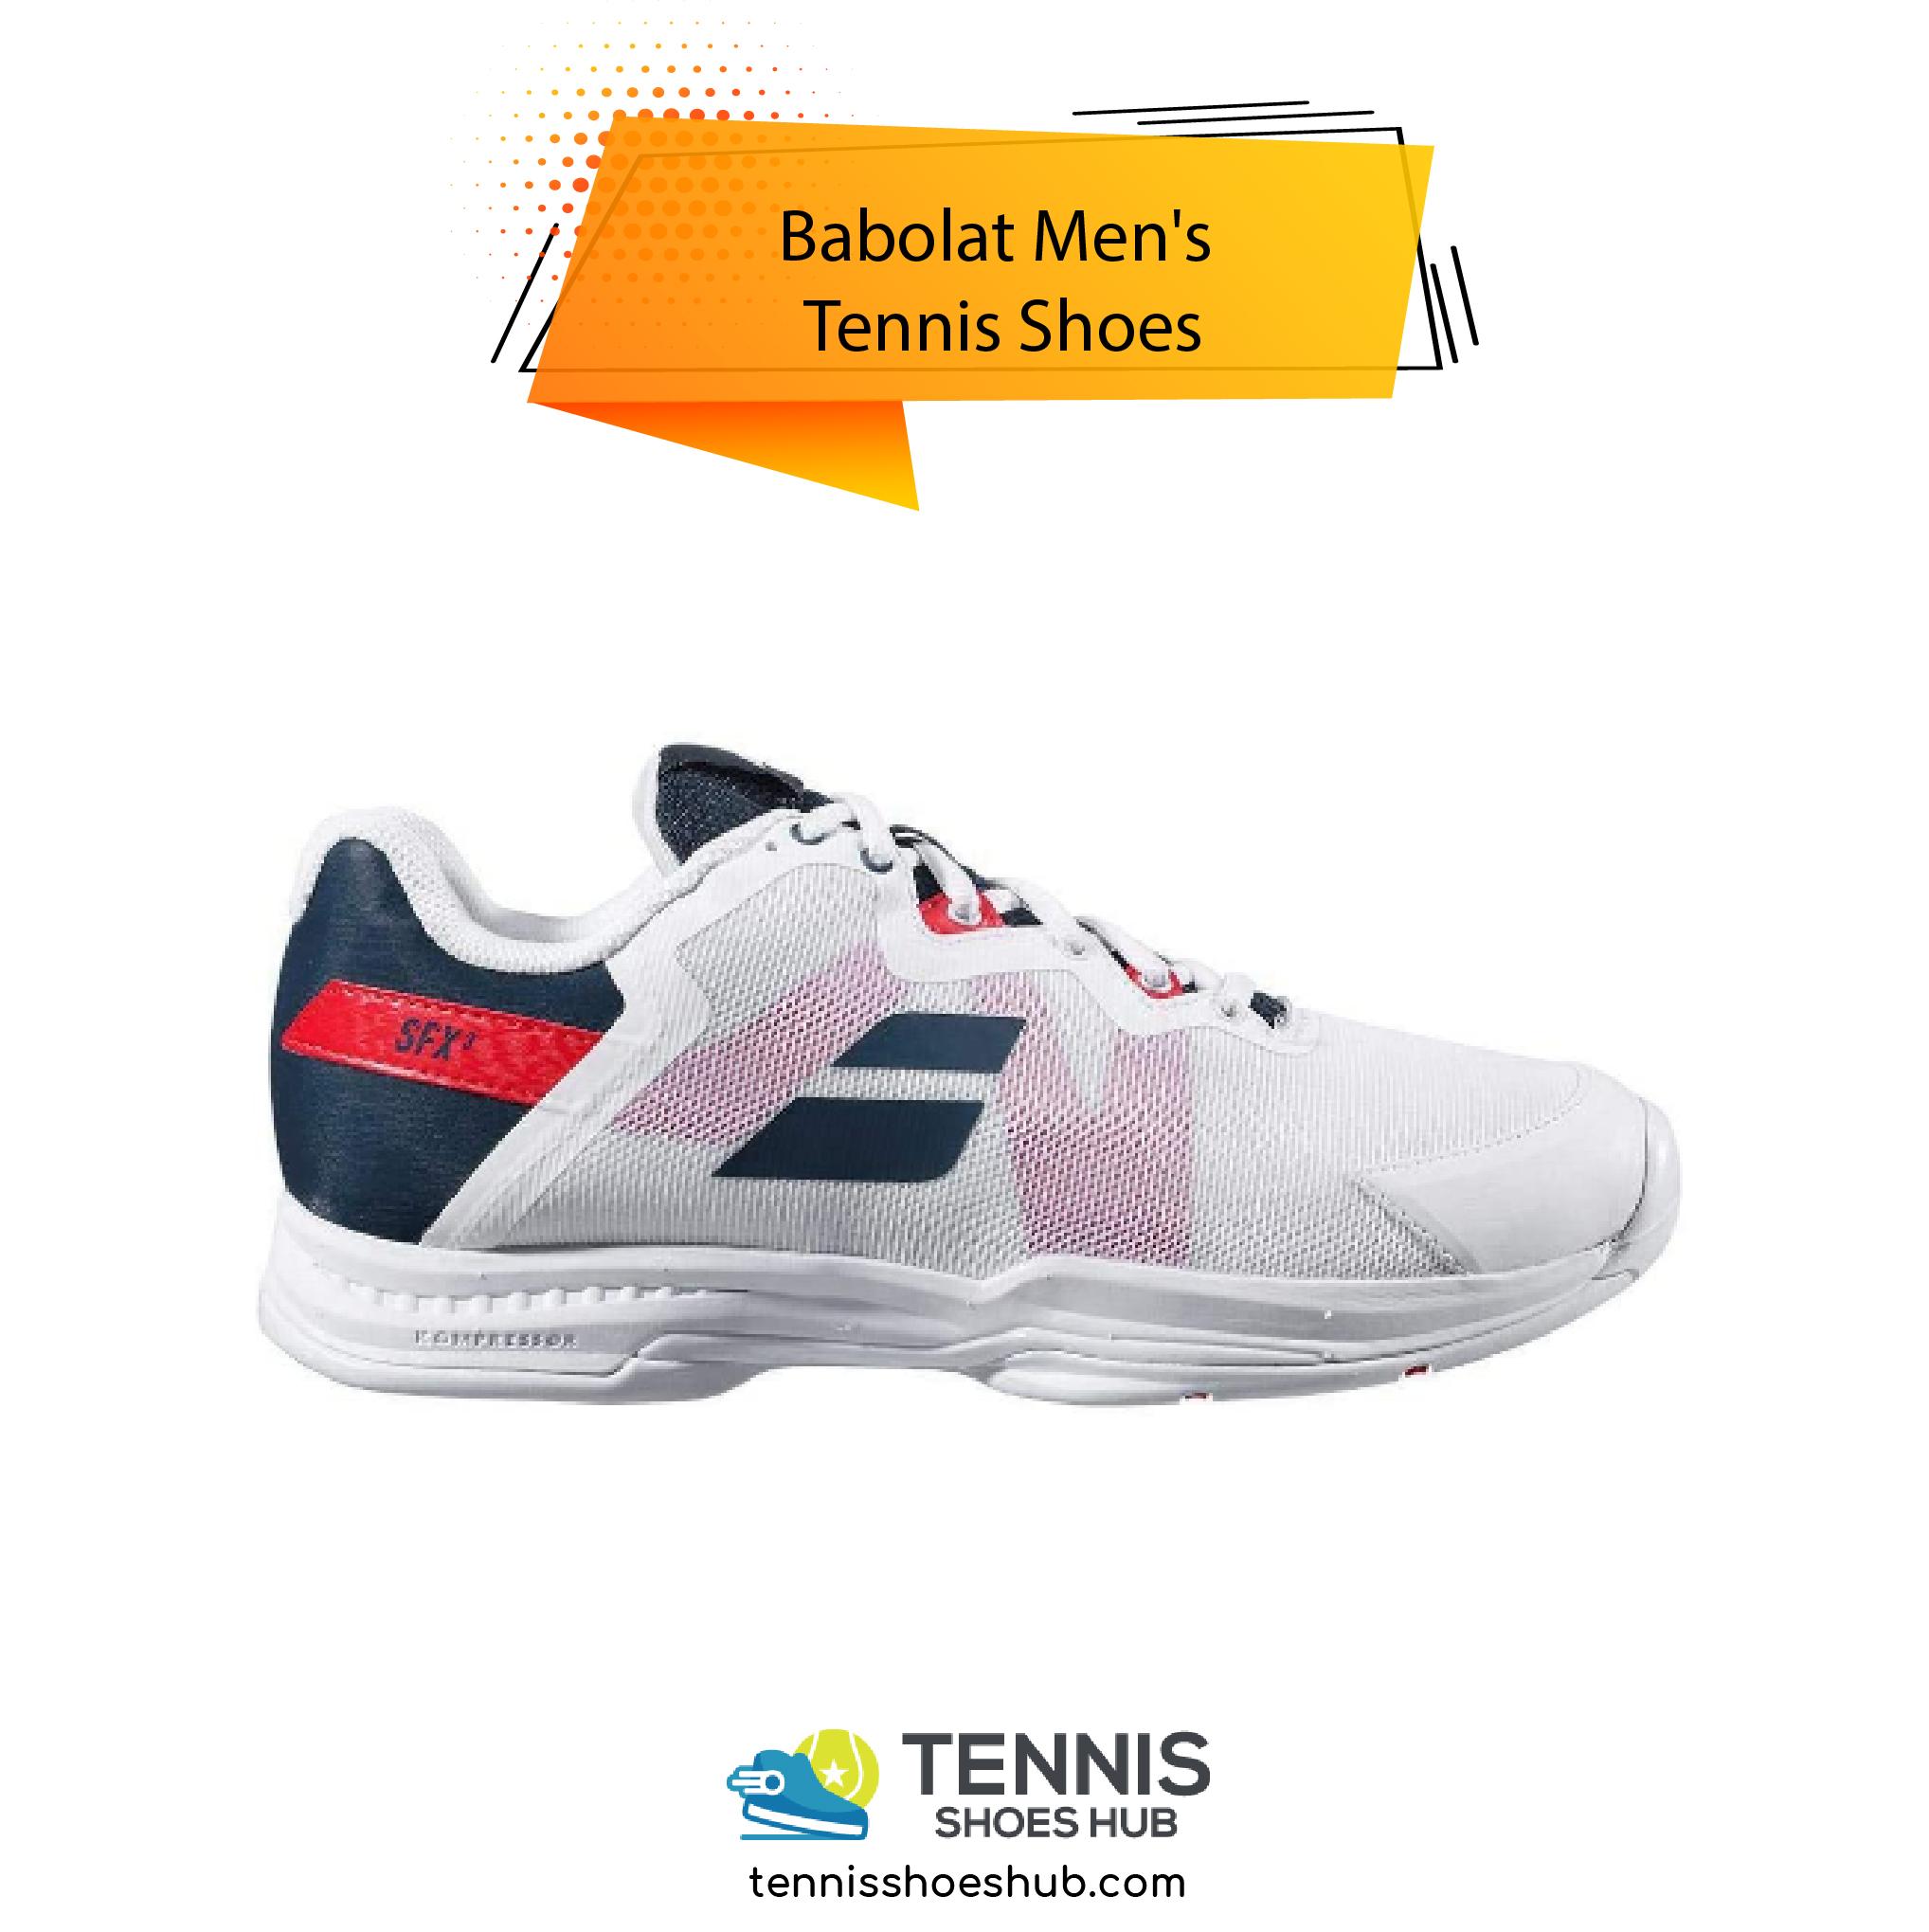 Babolat Mens Tennis Shoes 01